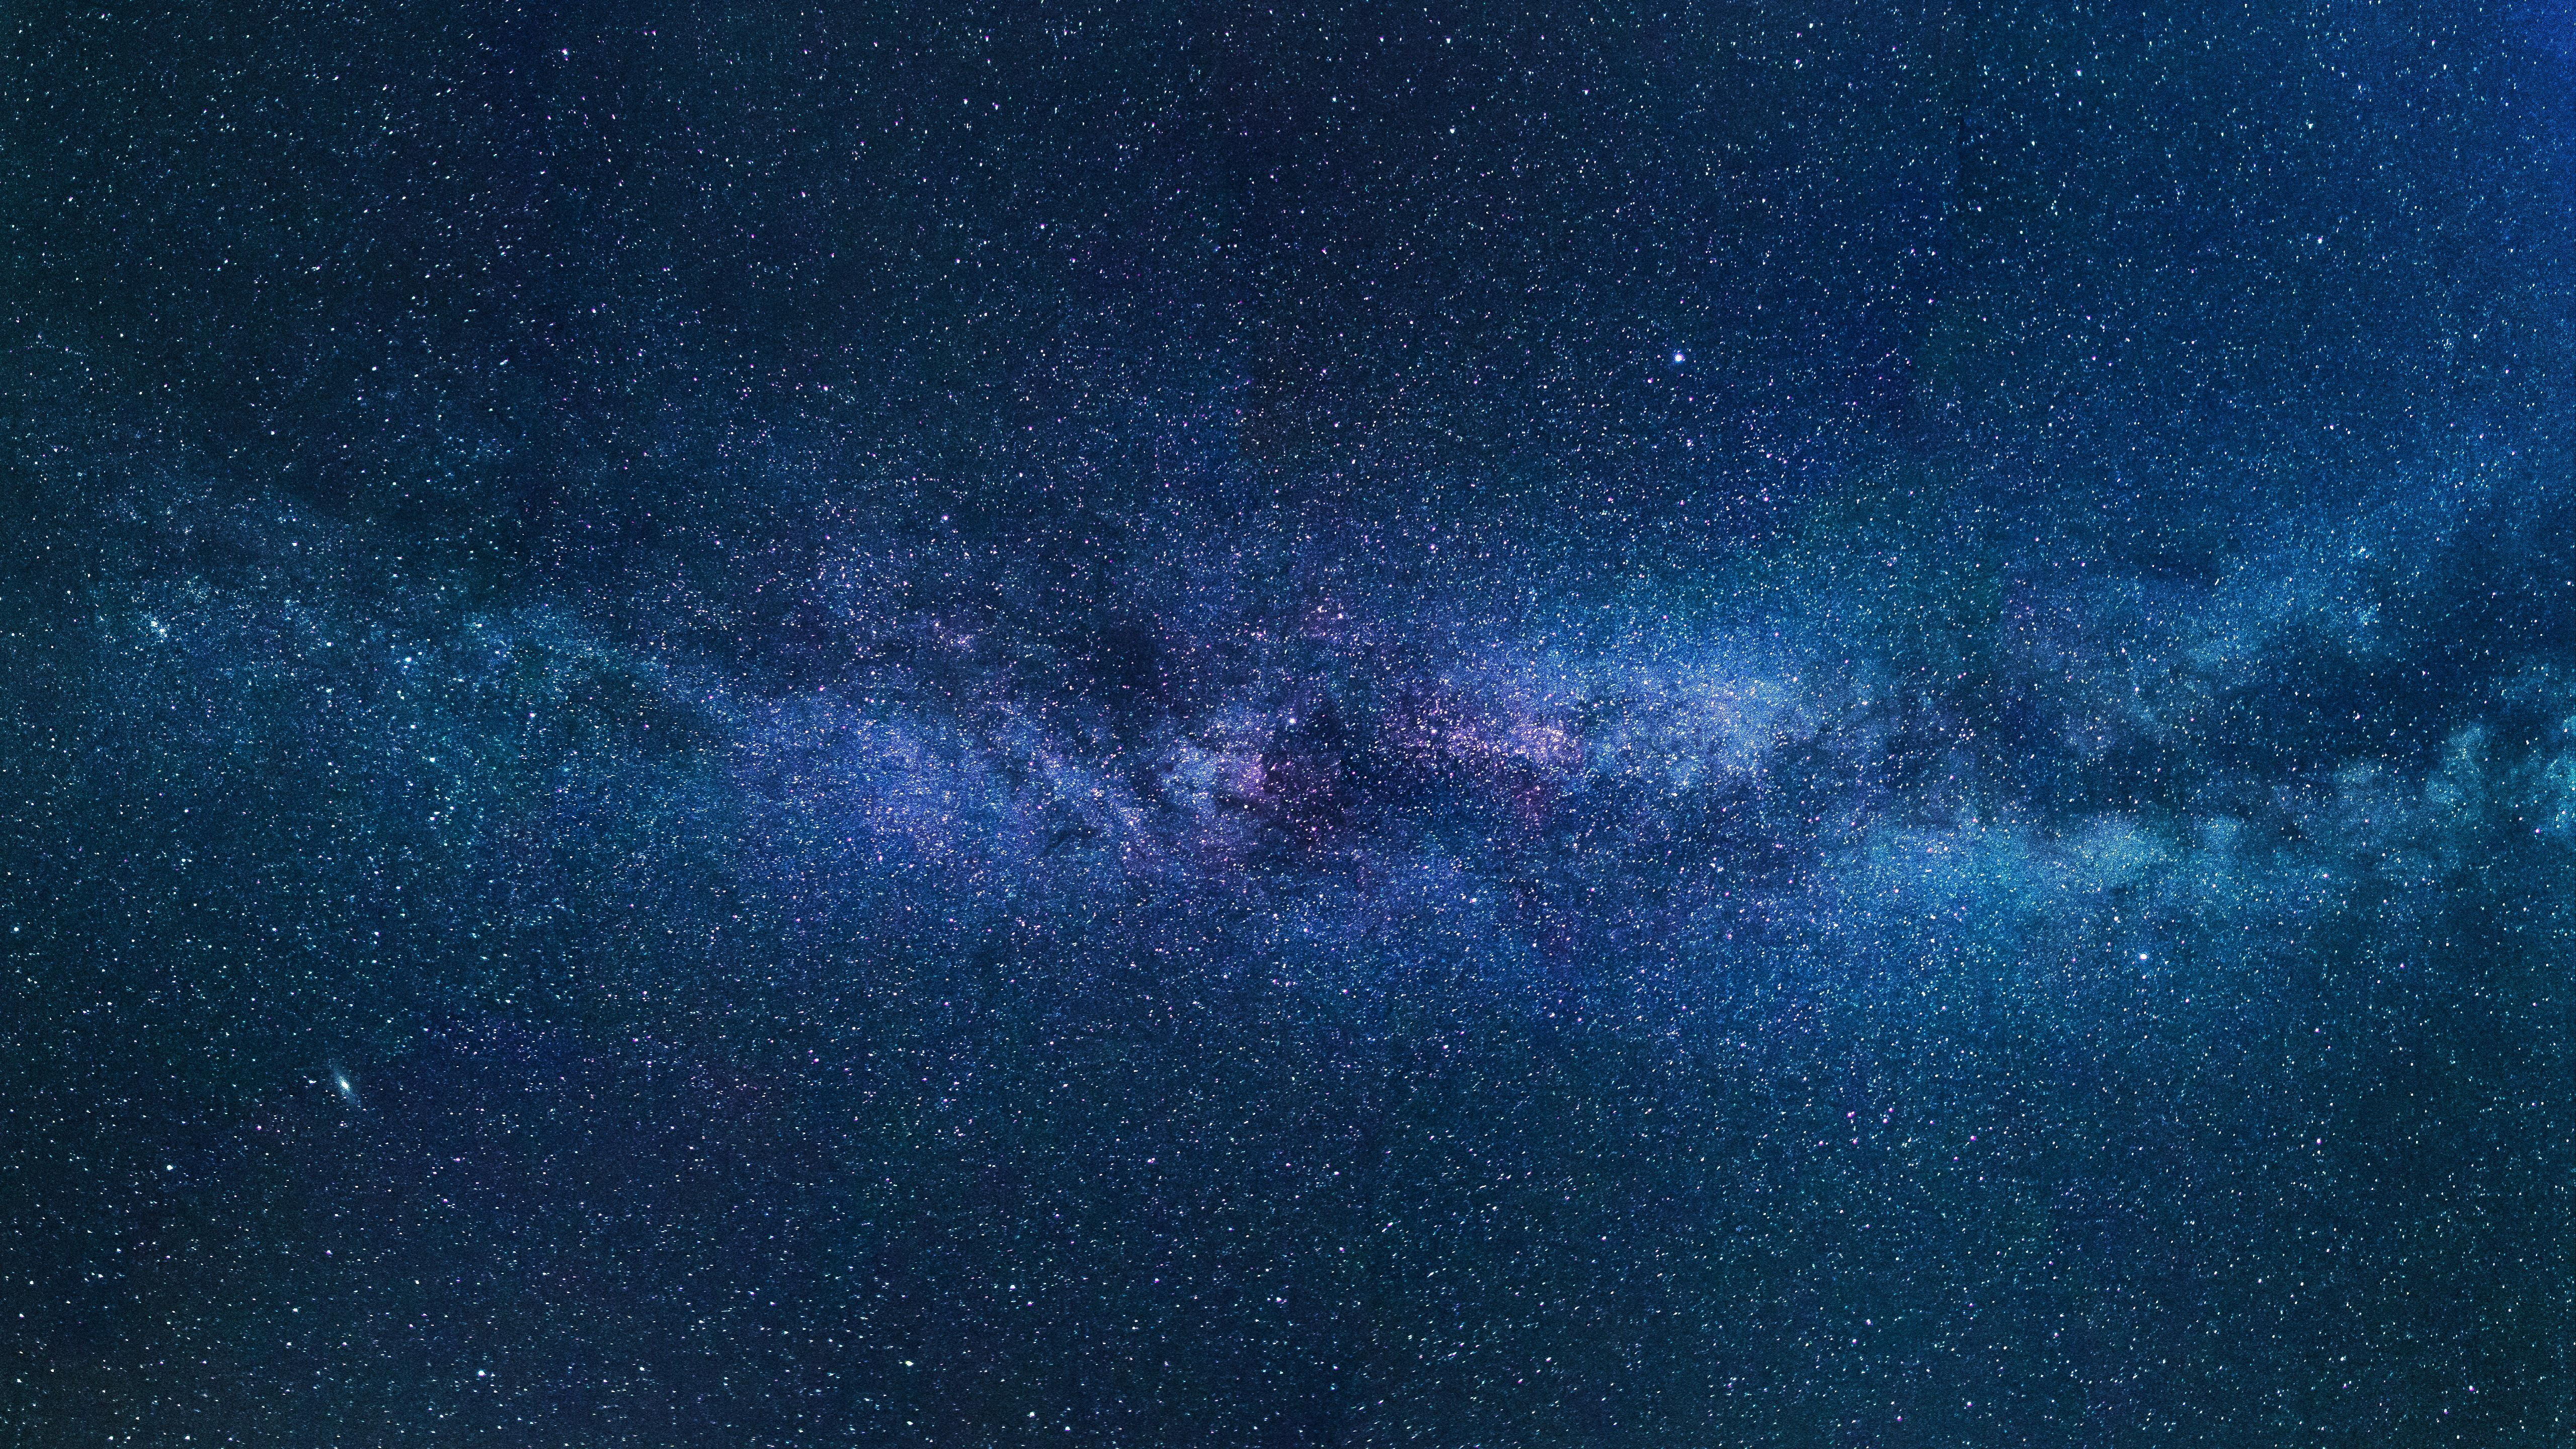 5120 x 2880] Milky Way Wallpaper in 2019 Wallpaper R 5120x2880